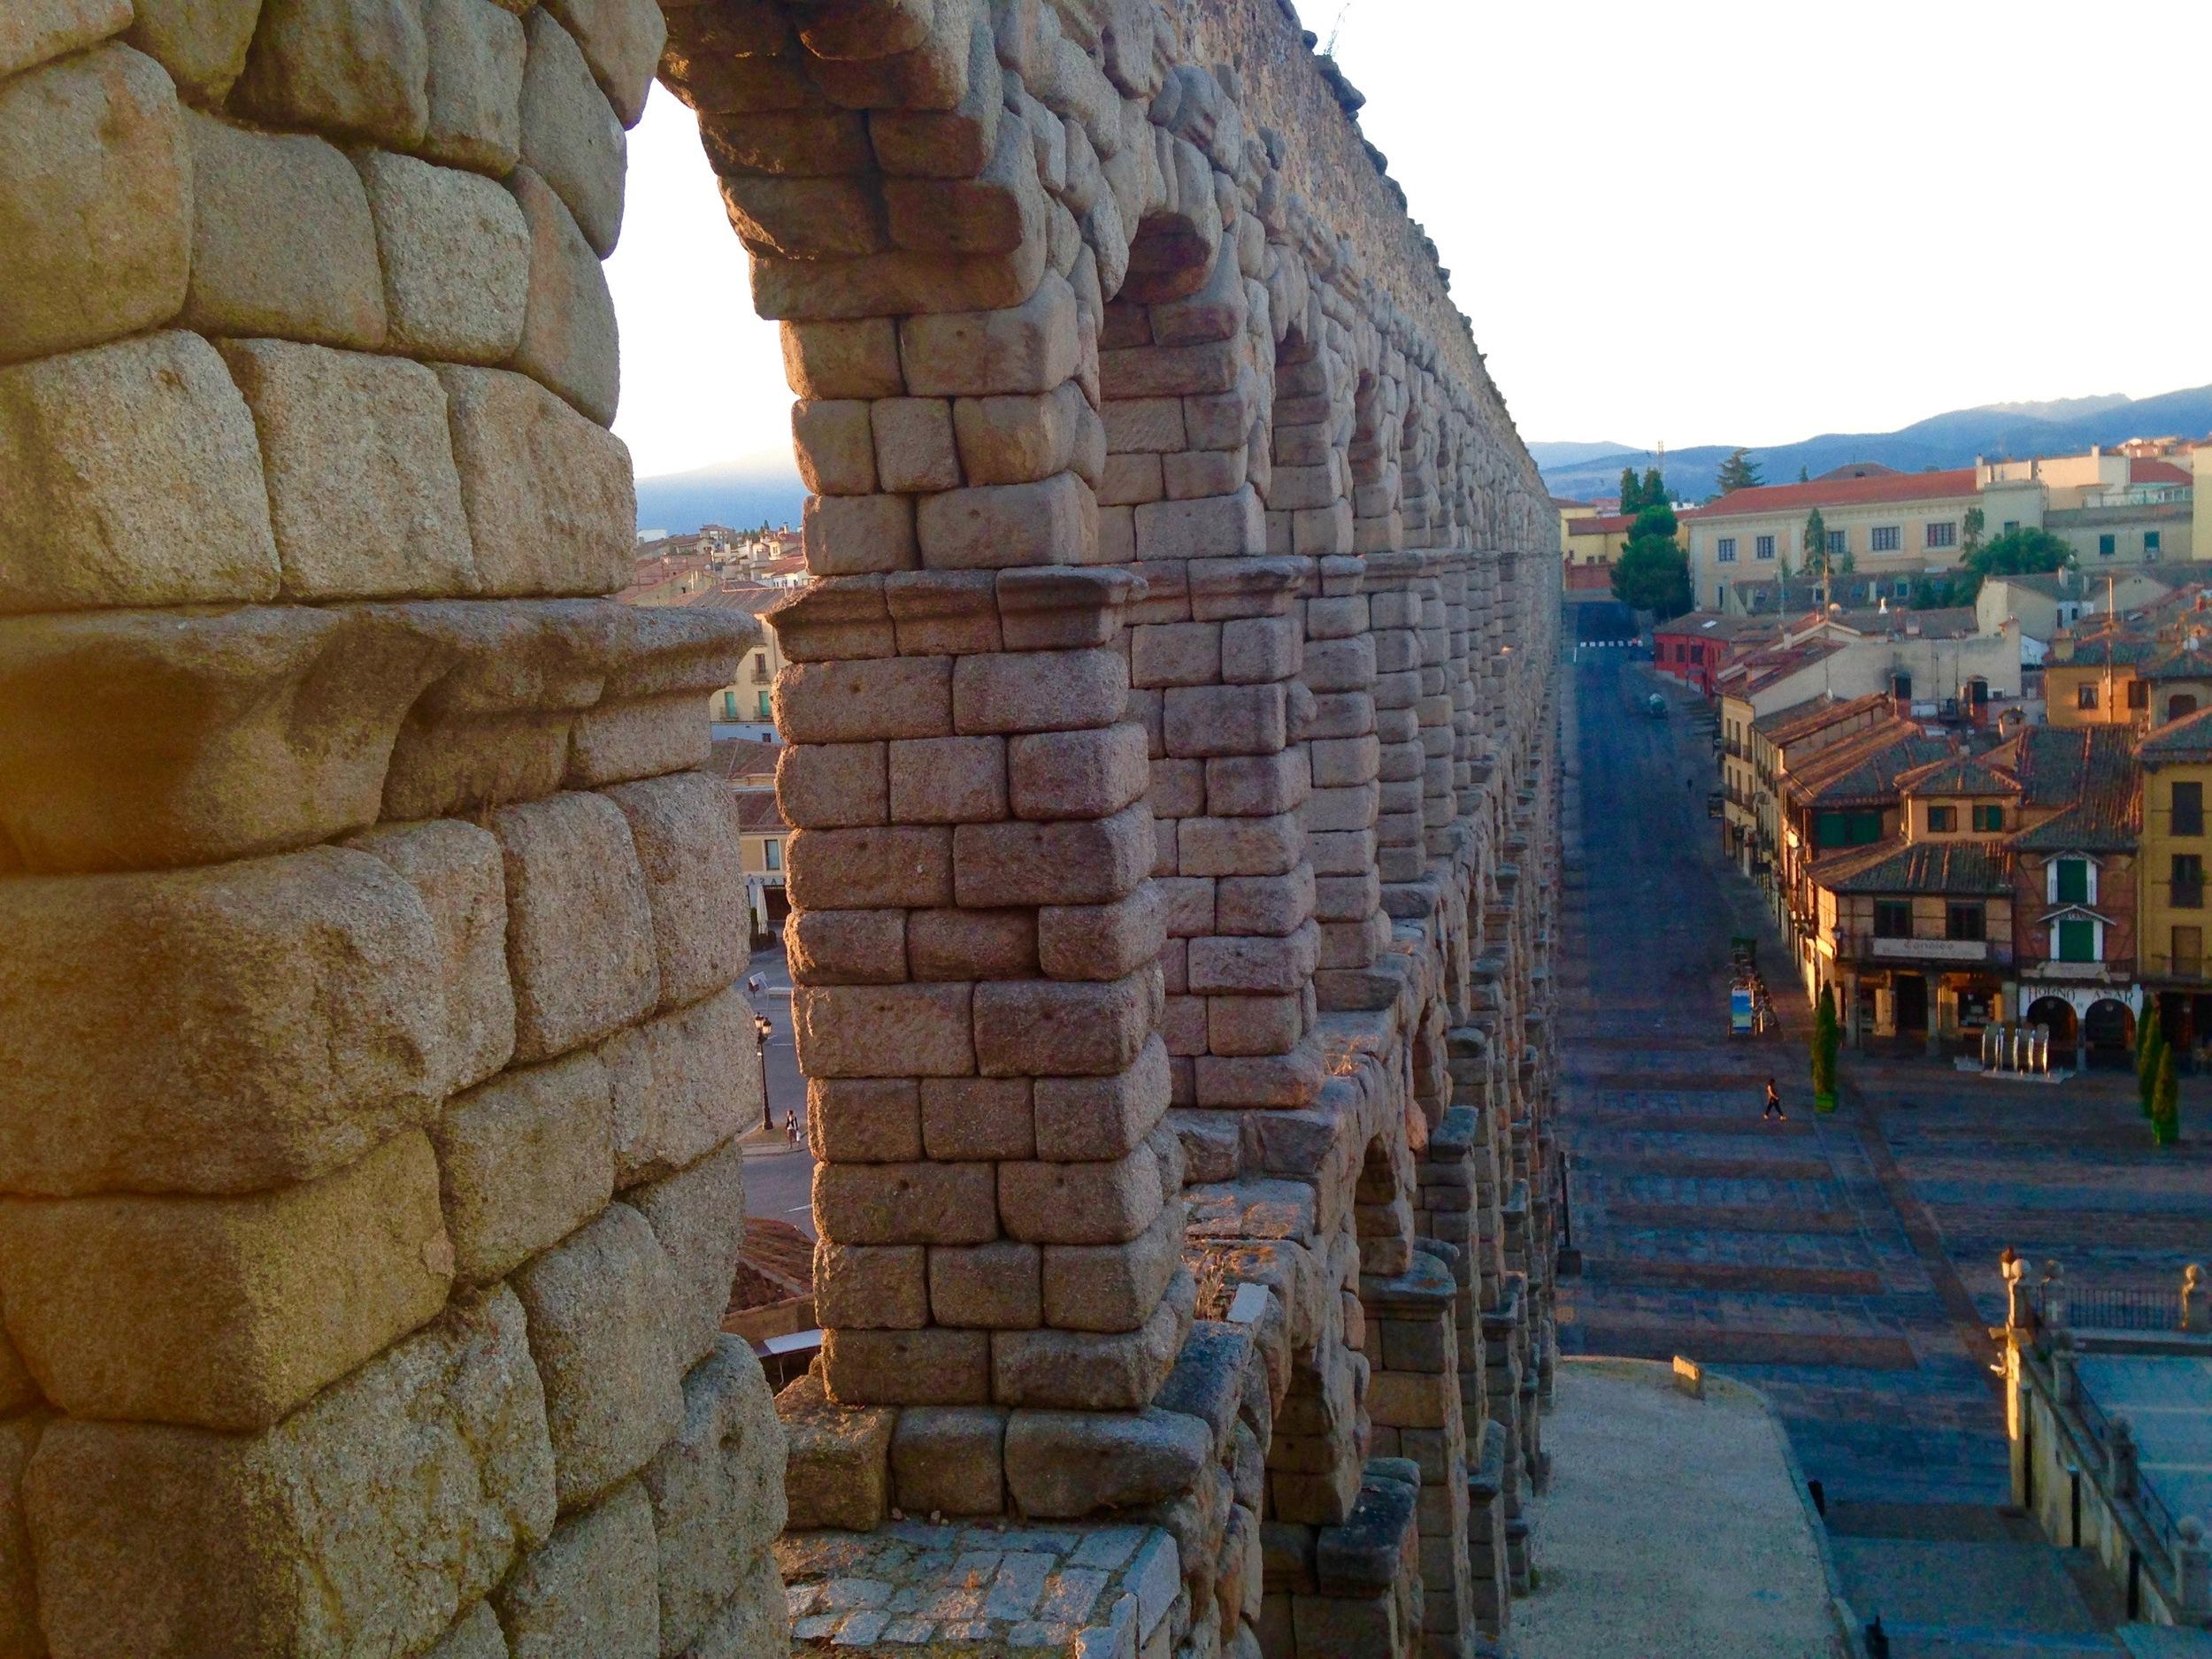 Dawn at the Aqueduct